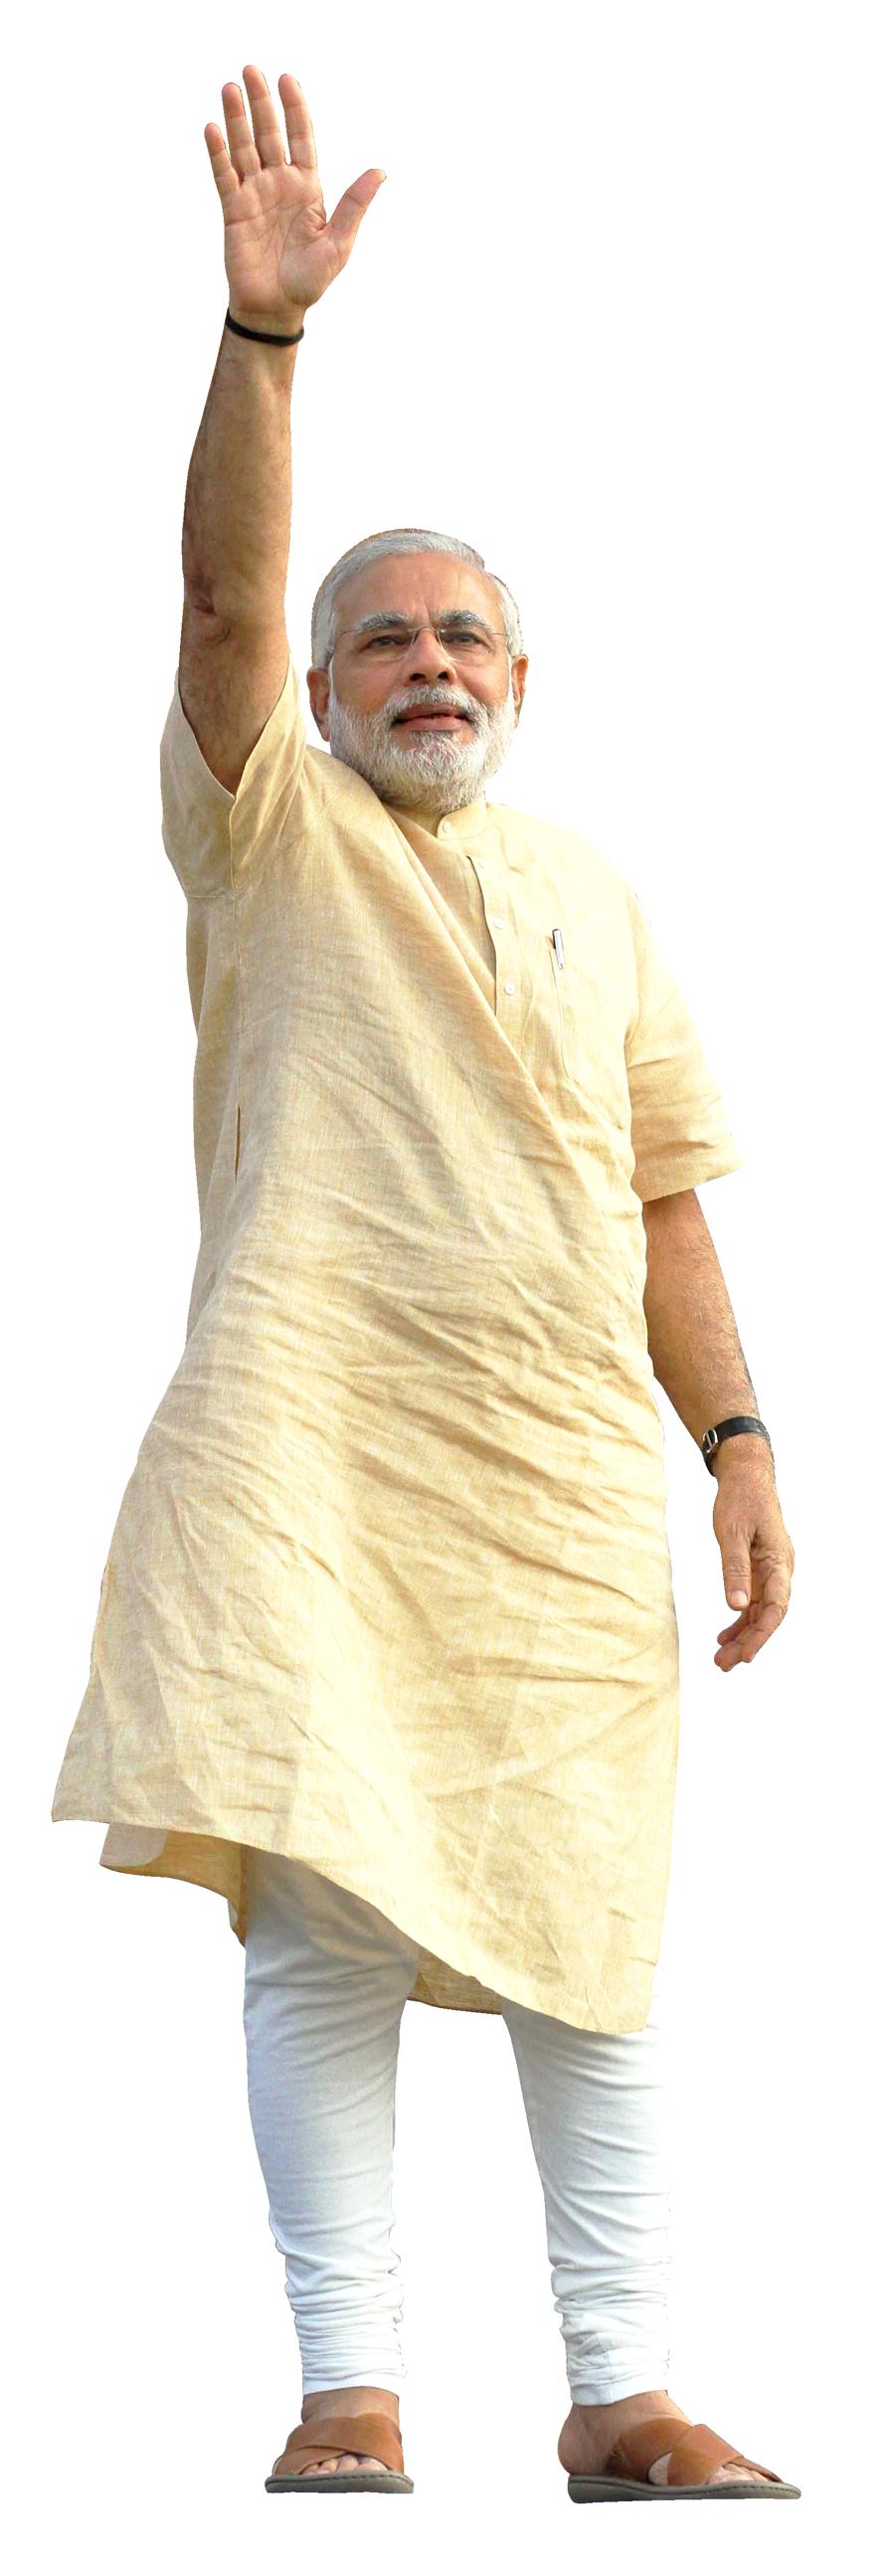 Download Narendra Modi Transparent Background HQ PNG Image ... Narendra Modi Standing Photo